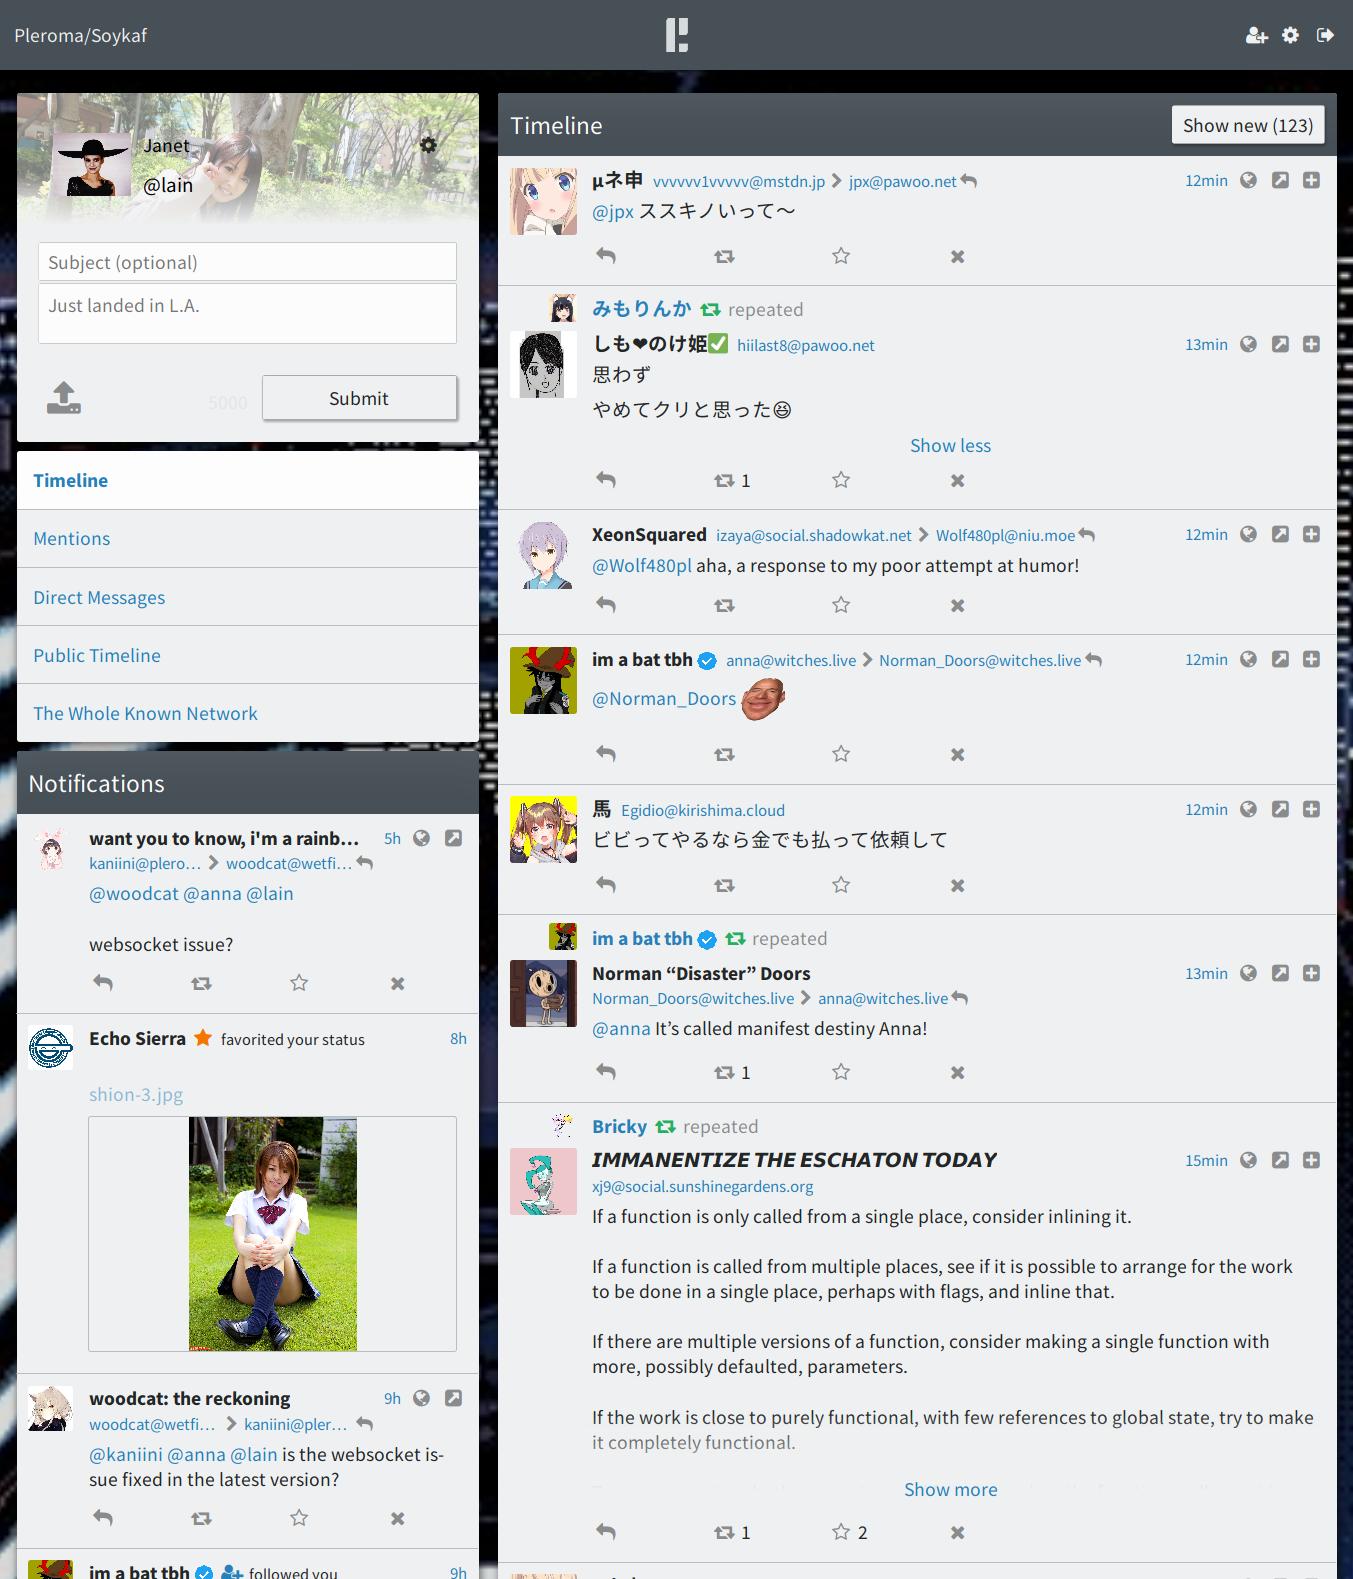 public/img/0.9.9.screenshot.png